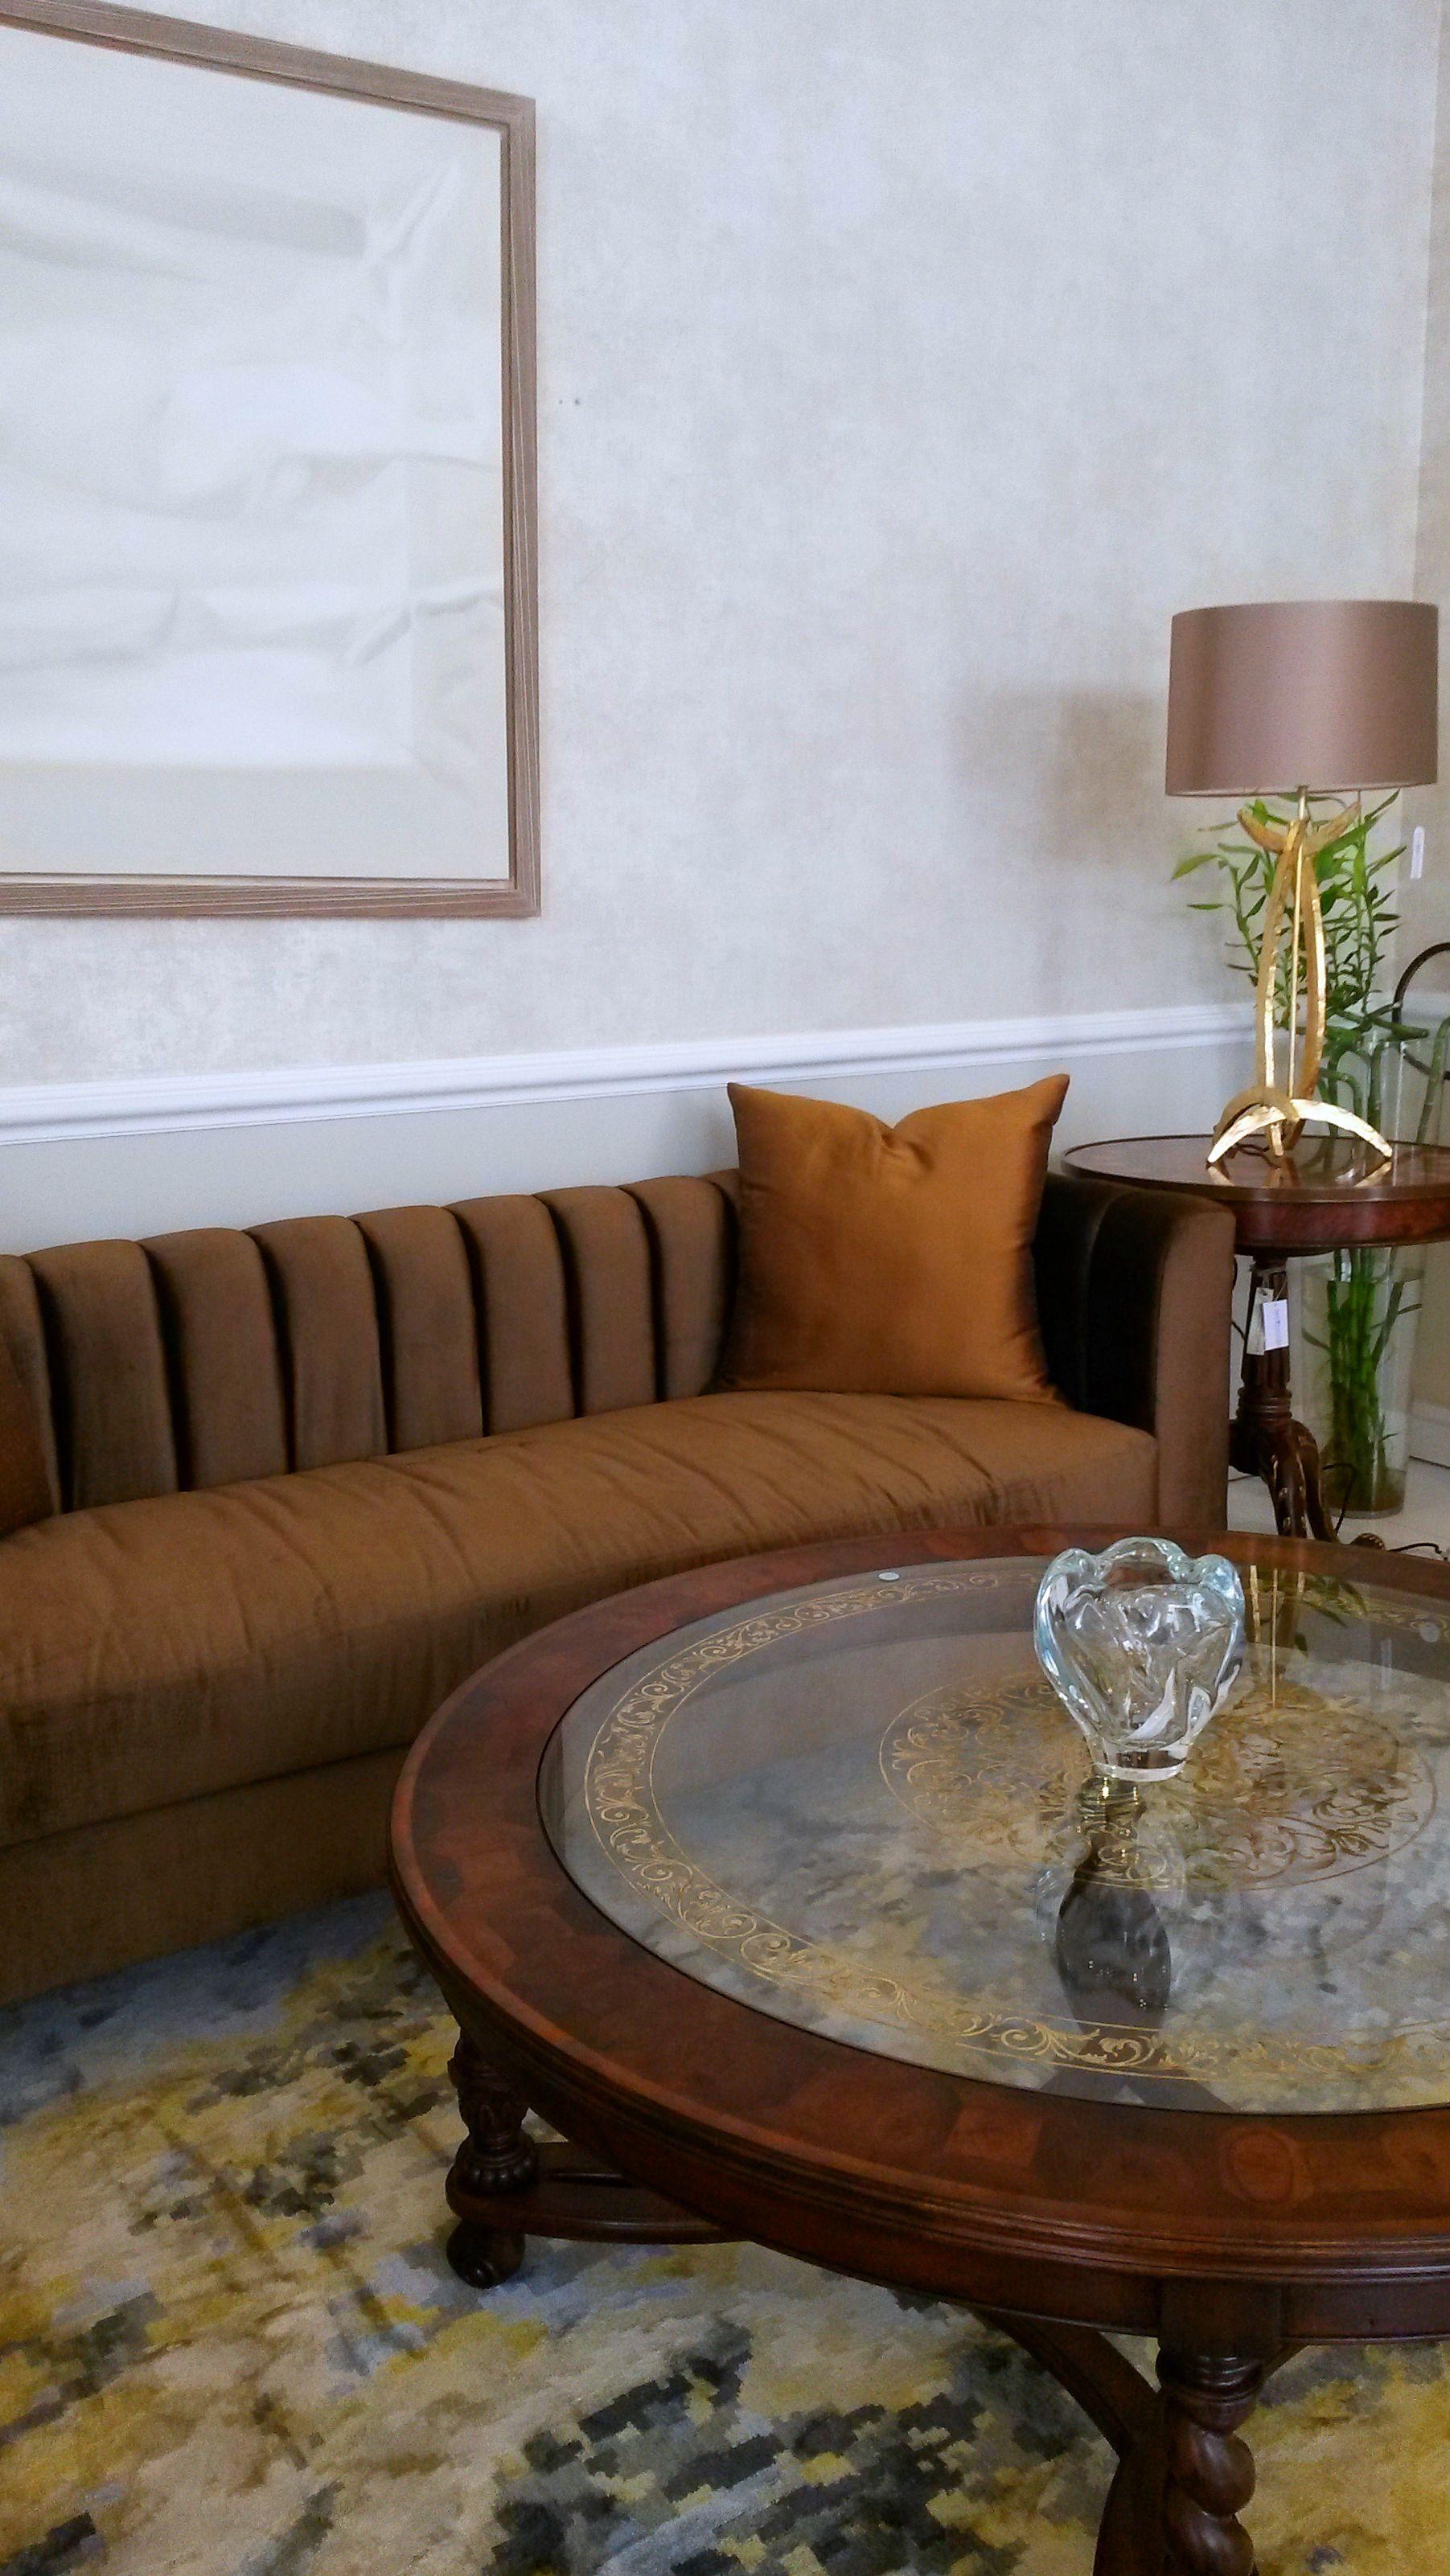 Bring Out Your Homeu0027s Unique Personality. #ExclusiveLiving Ayka Design  Porta Romana Jonathan. Dubai UaeFine FurnitureUniqueDesignShowroomHome